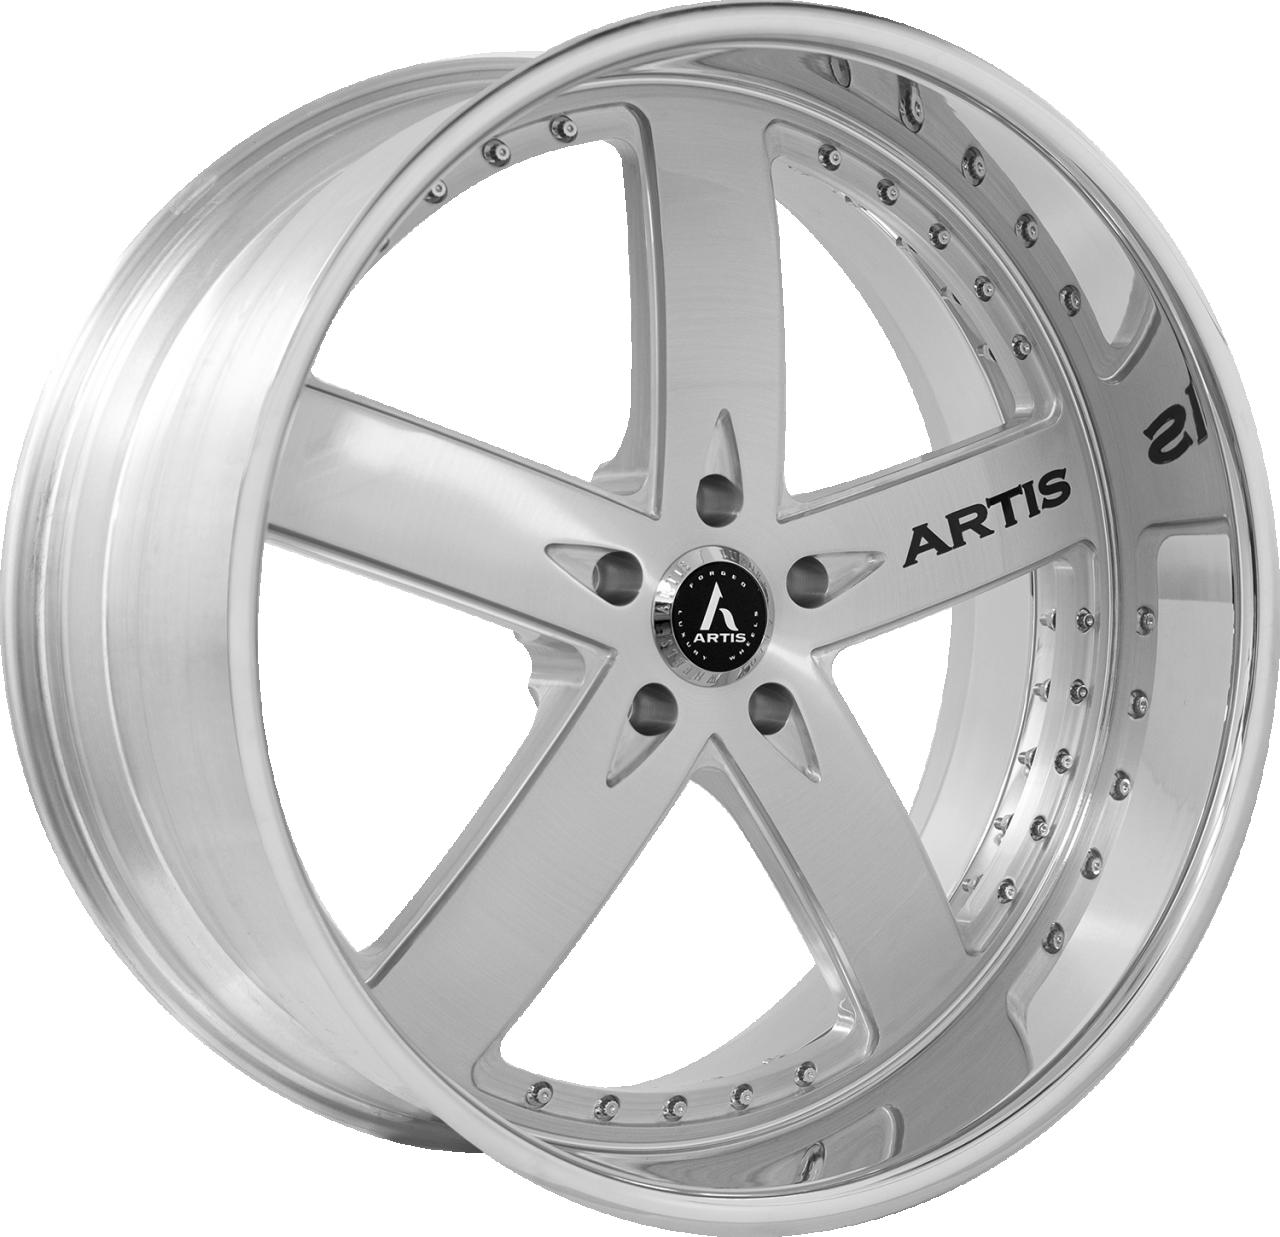 Artis Forged Booya-M wheel with Brushed finish